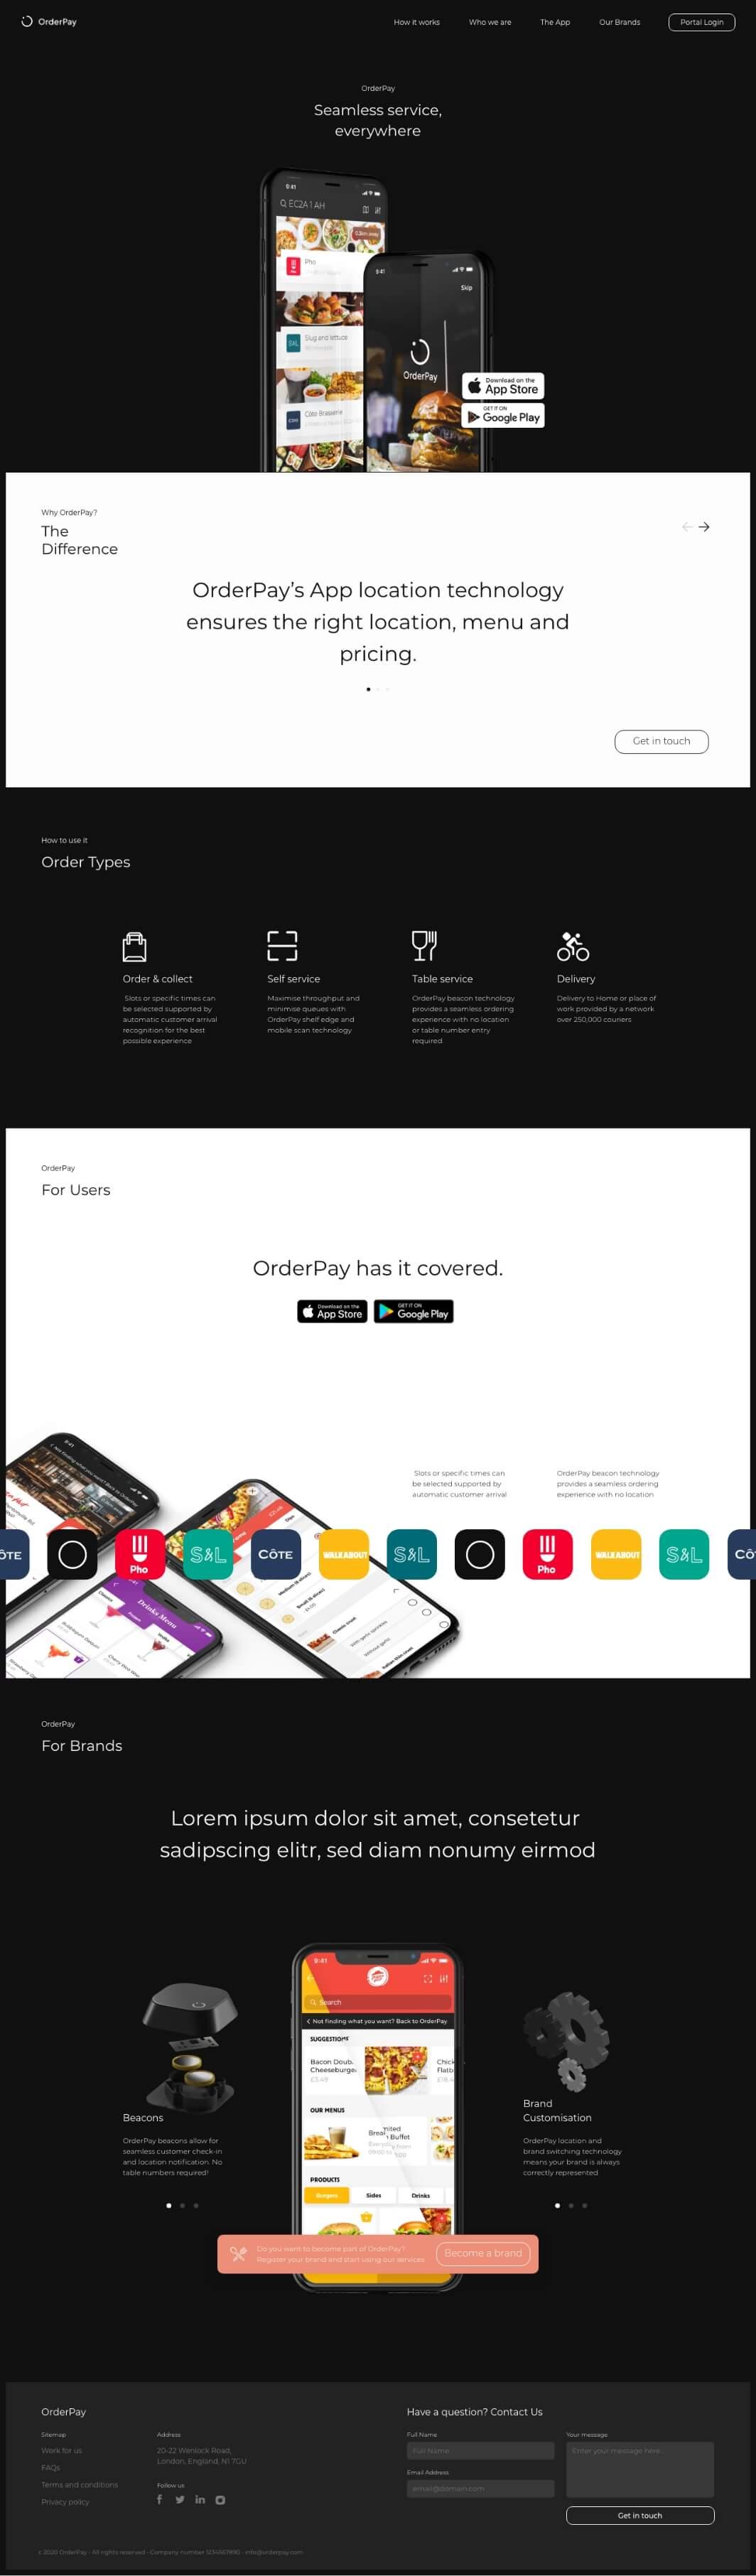 Orderpay website screen